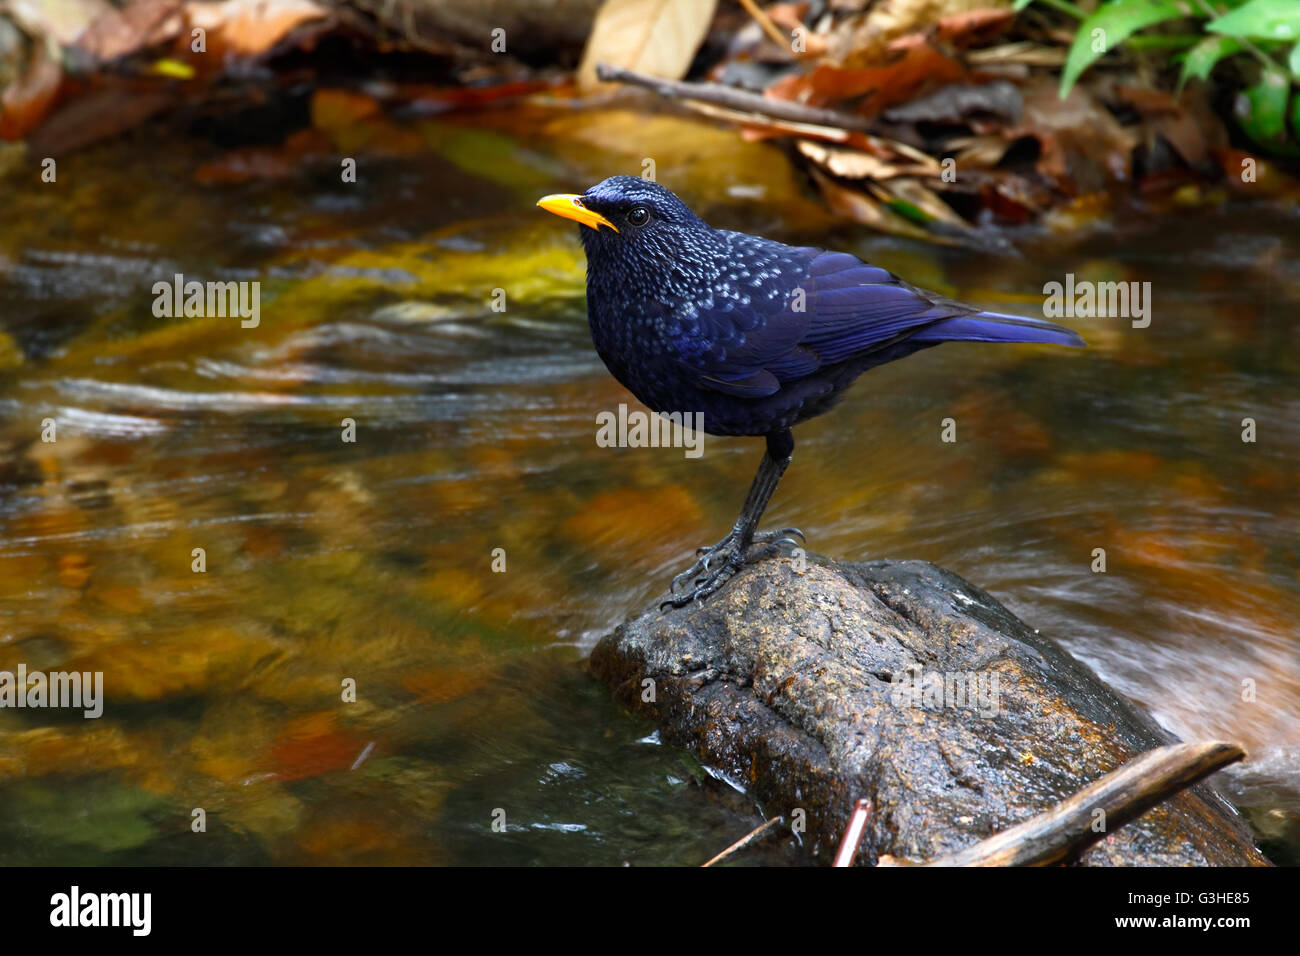 Blue whistling thrush (Myophonus caeruleus eugenei) found in Indian subcontinent and Southeast Asia Stock Photo